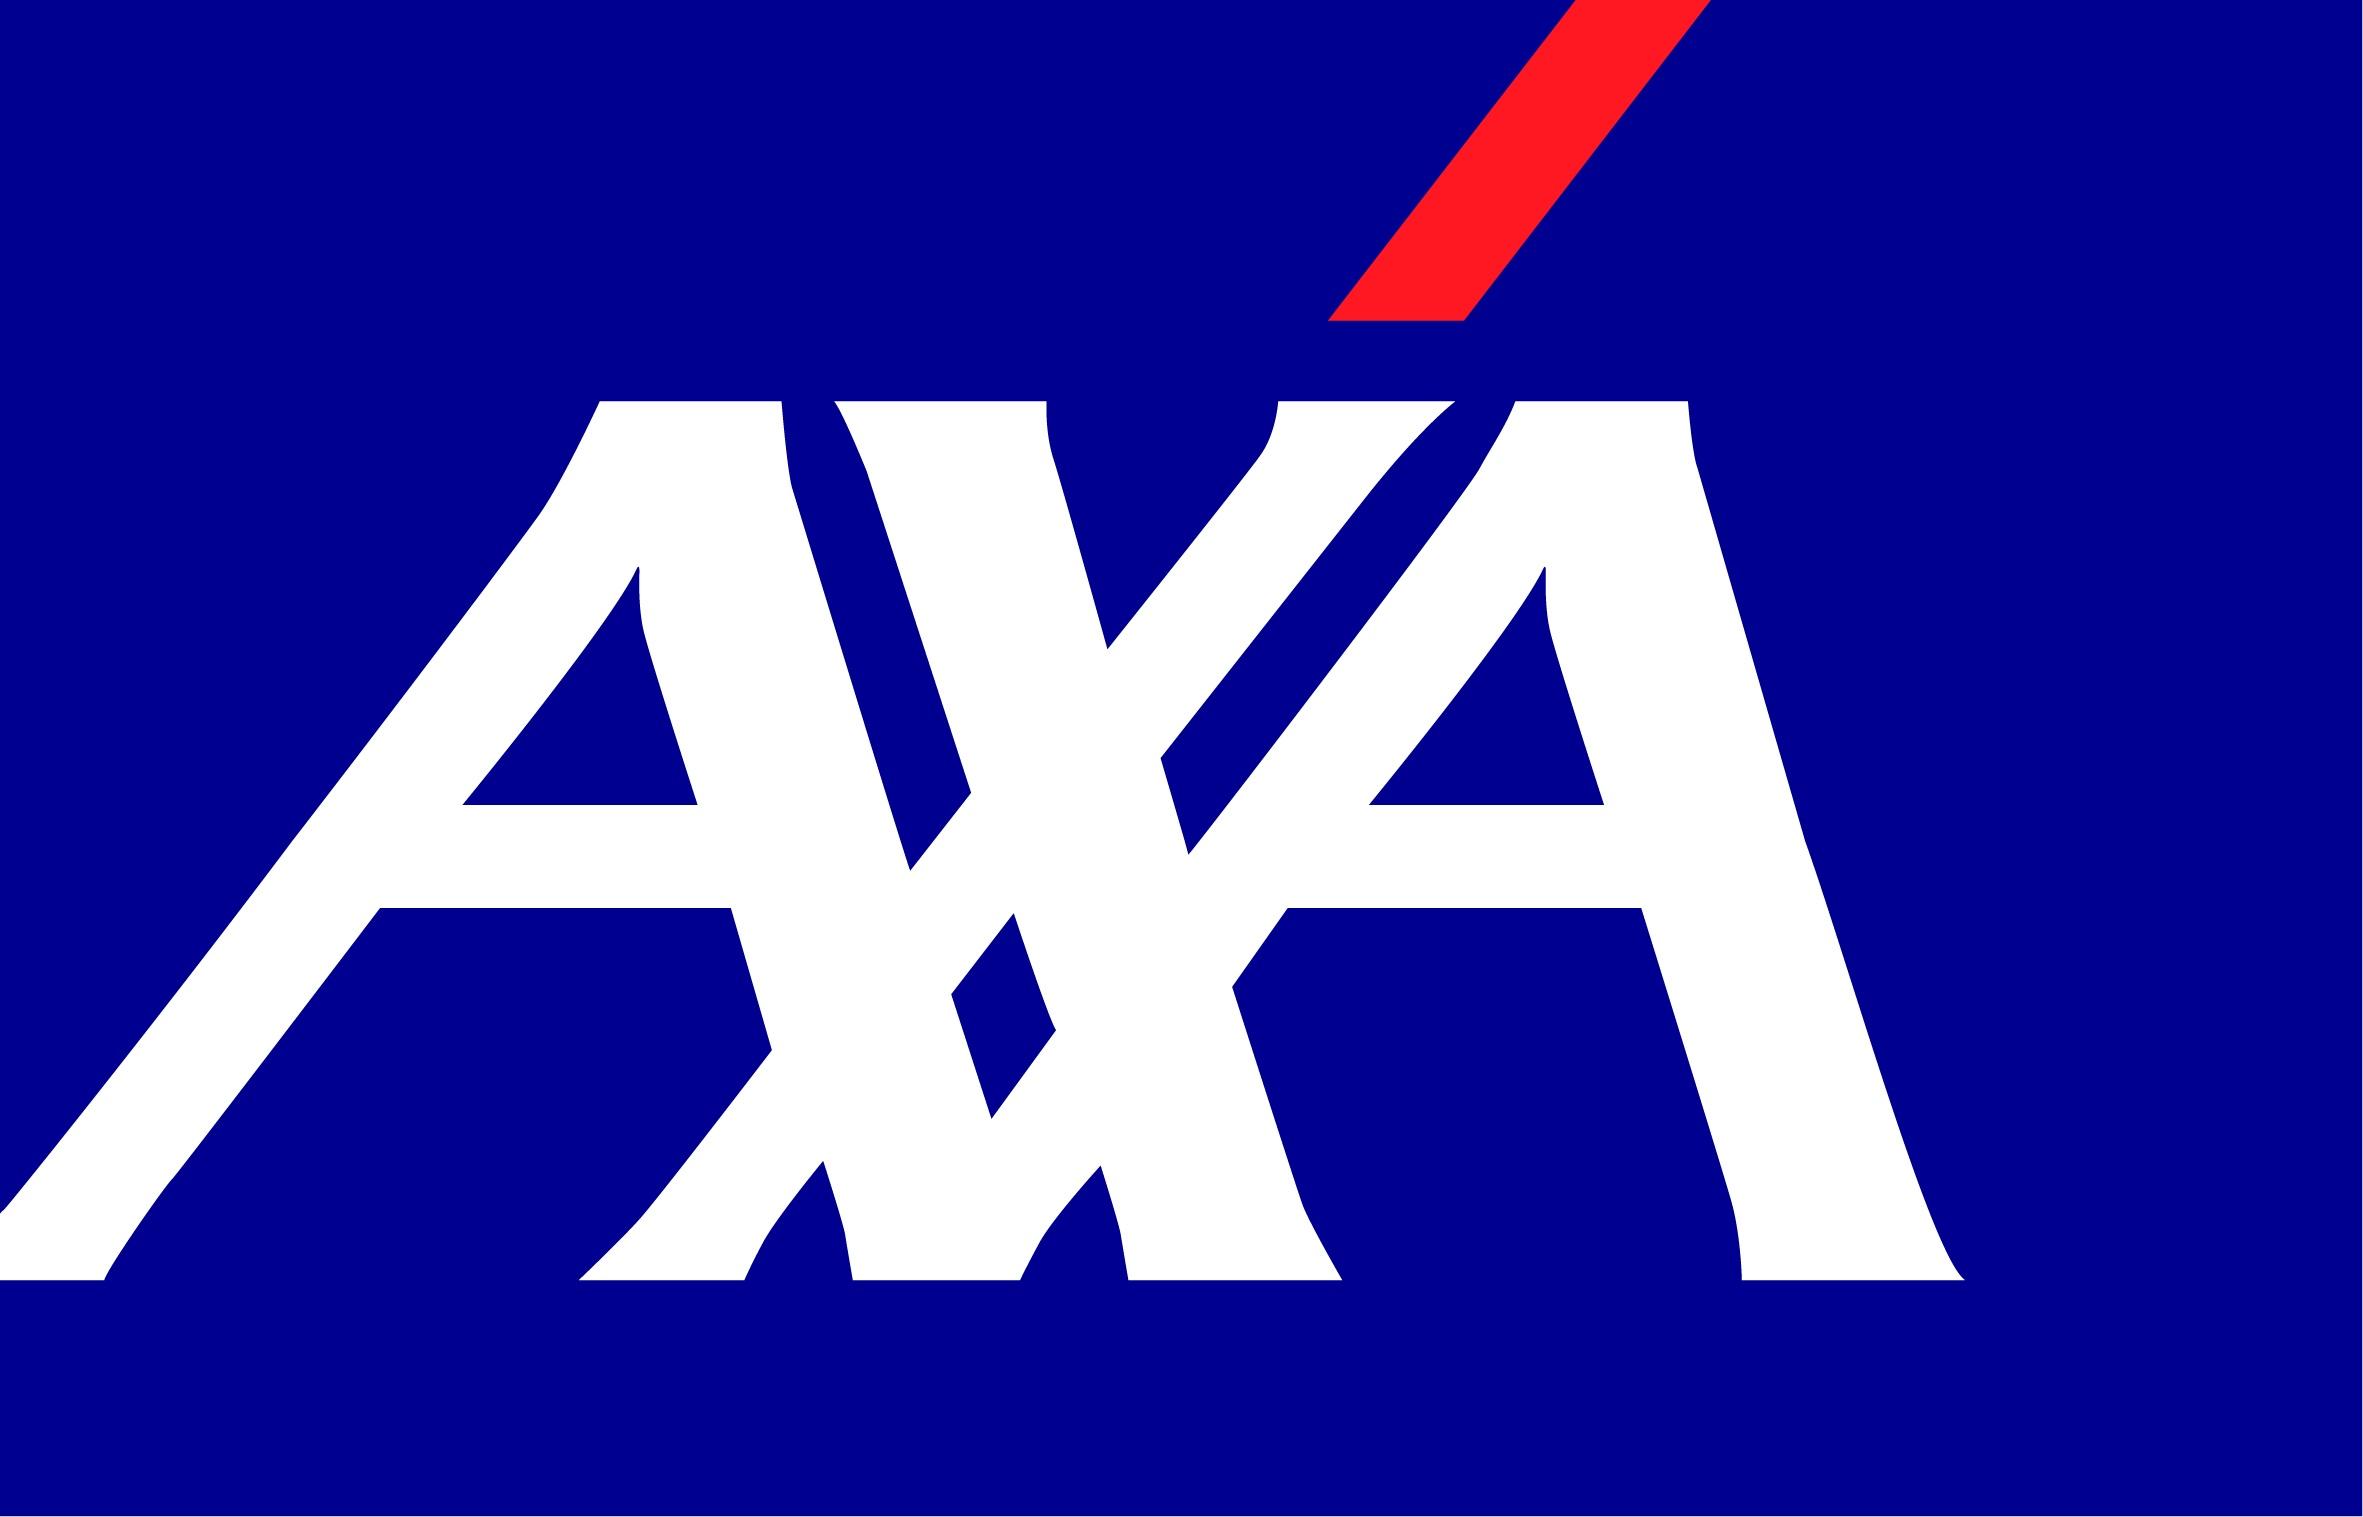 Deal στις ασφάλειες: Πουλήθηκε η ασφαλιστική δραστηριότητα της AXA προς την Generali